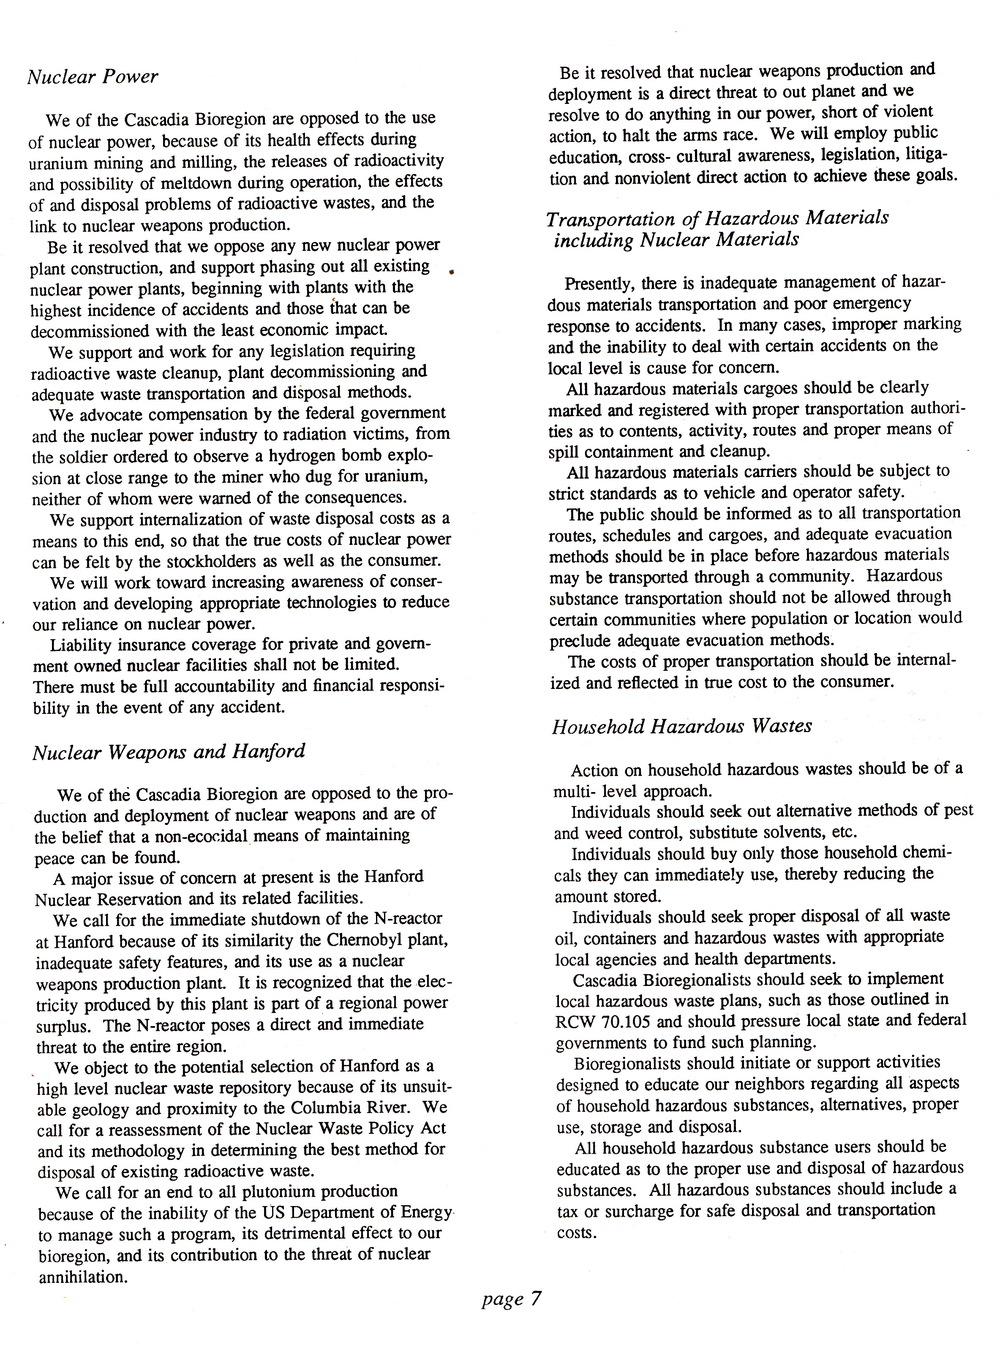 Cascadia Bioregional Congress 1986 Proceedings_0007.jpg